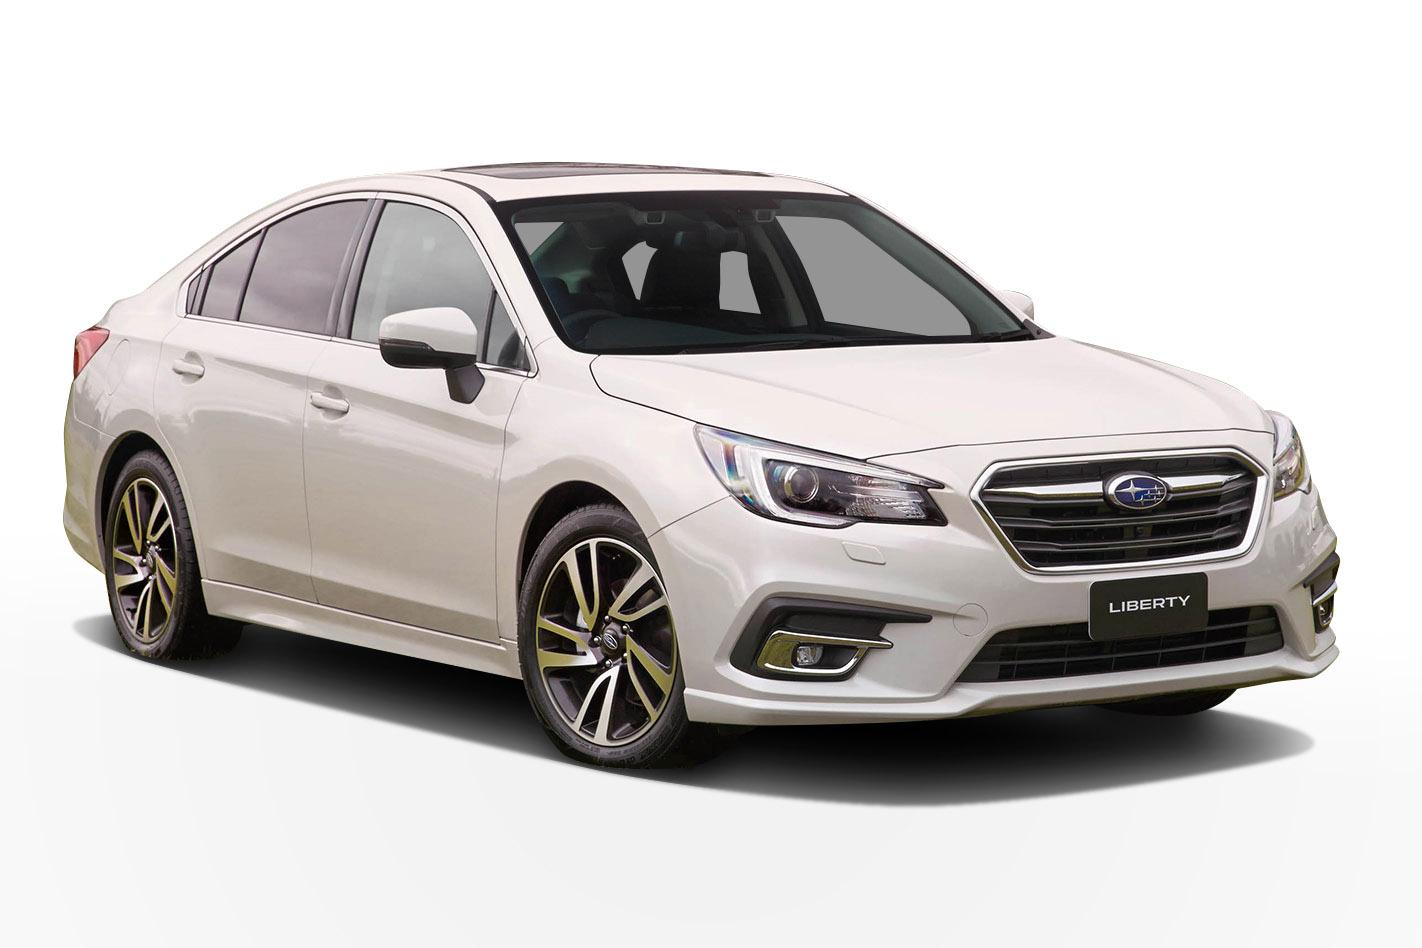 2020 Subaru Liberty Price